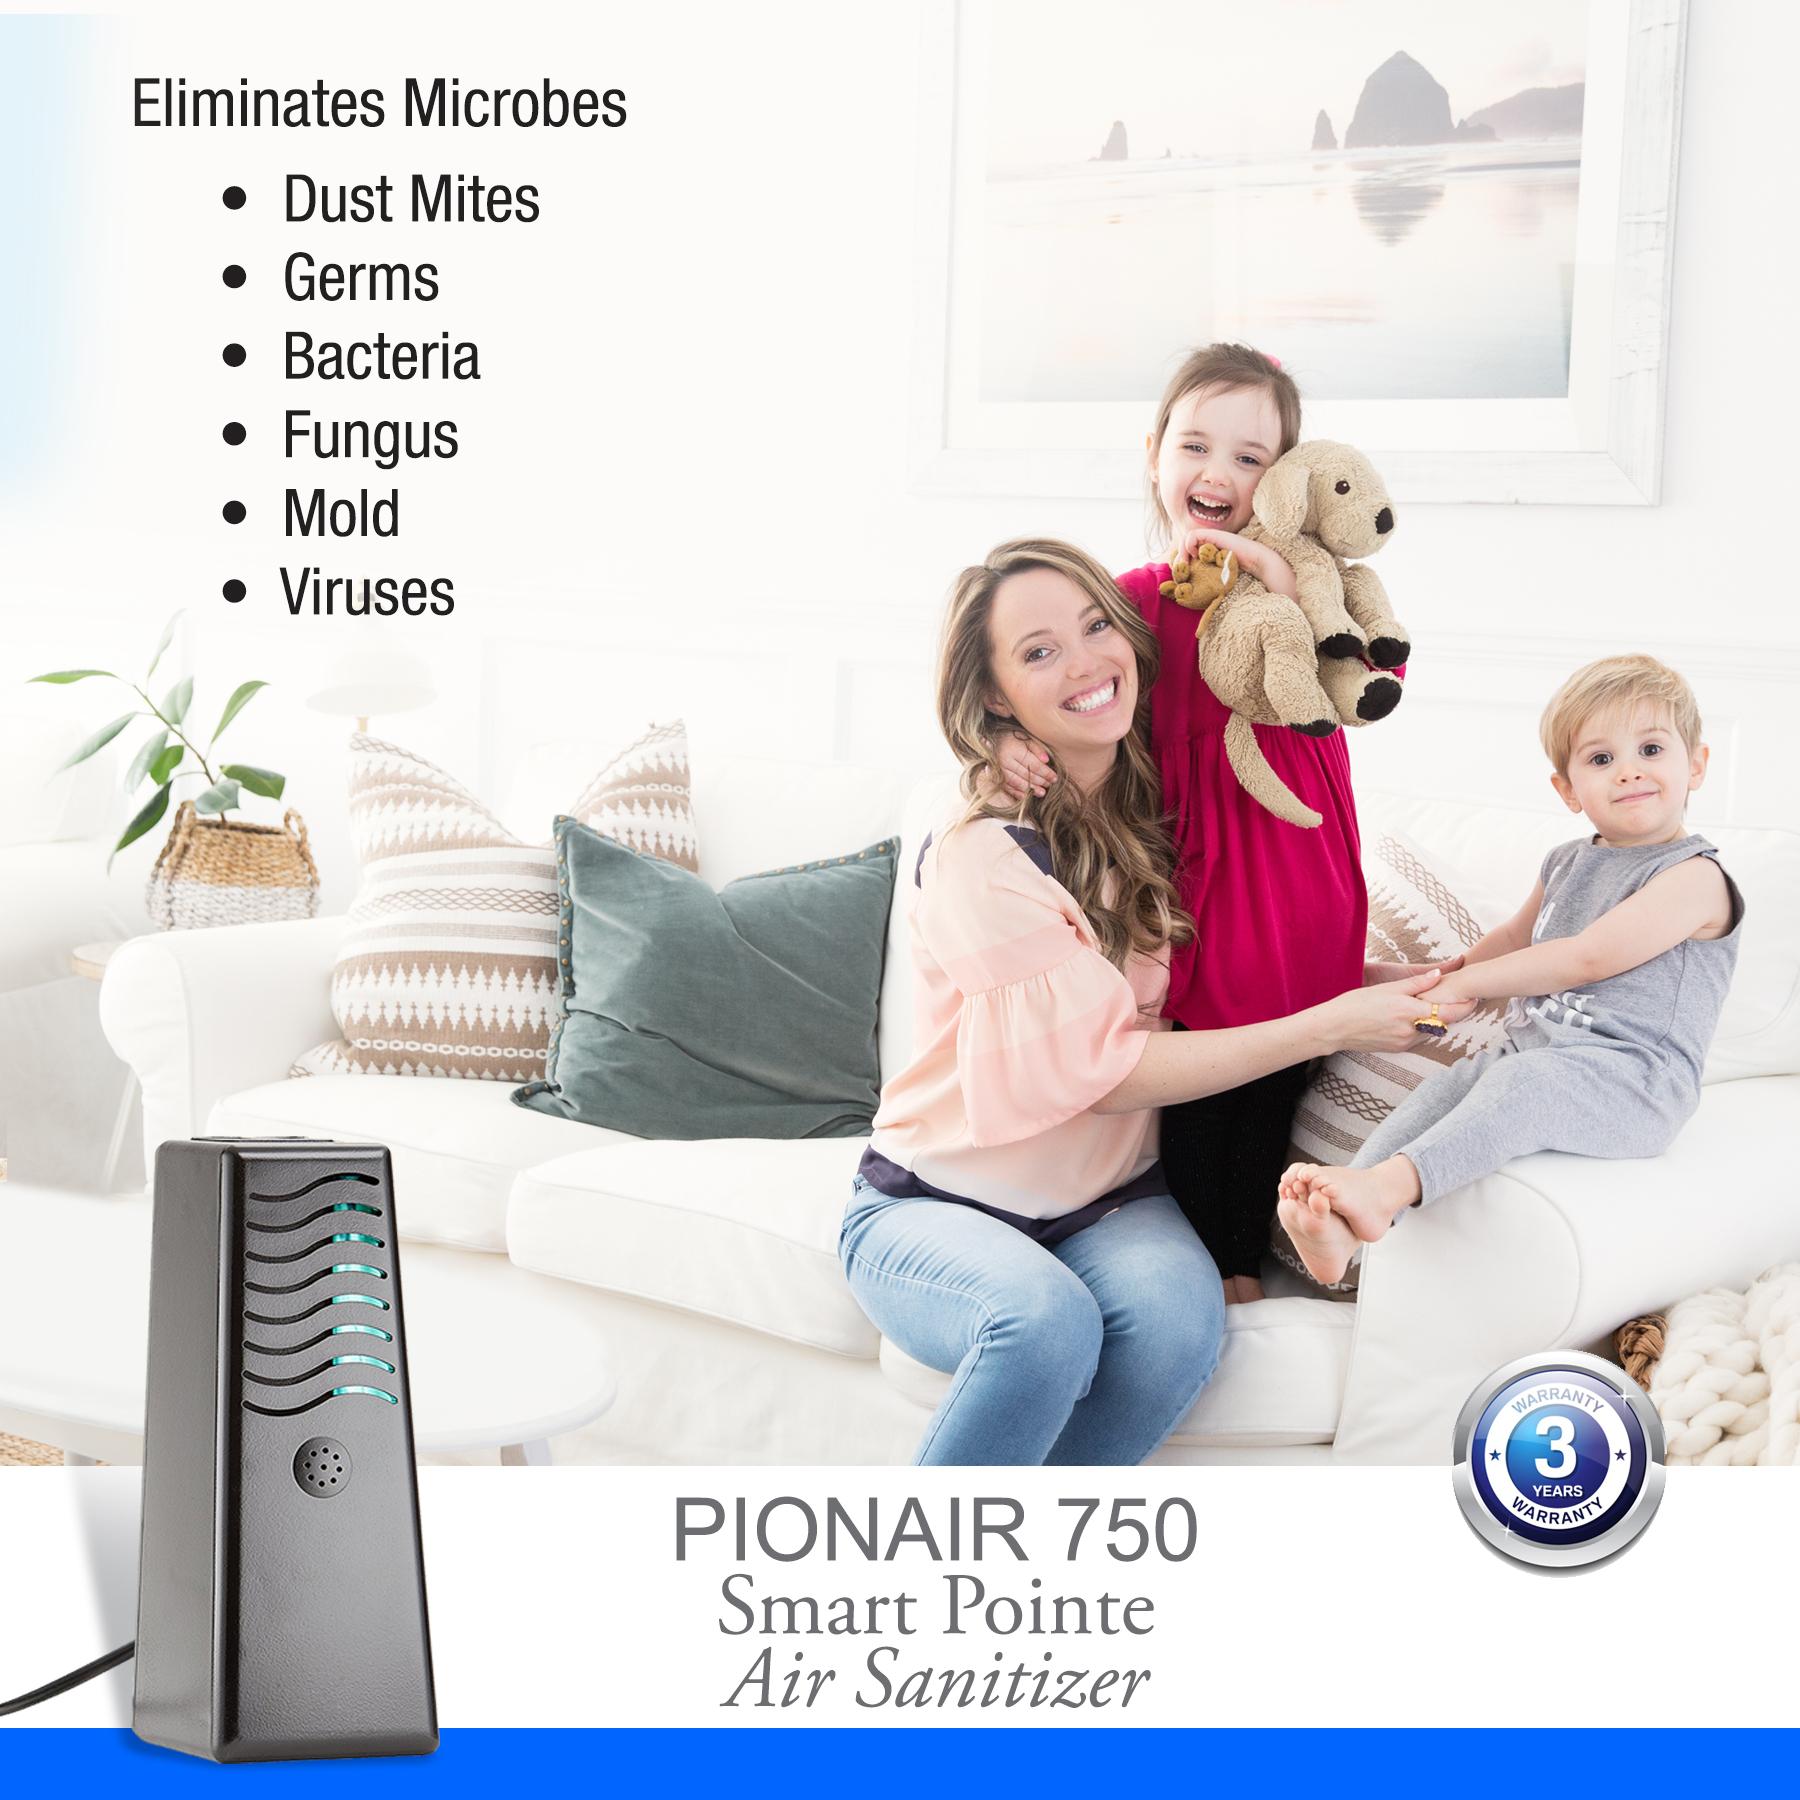 PIONAIR 750 Smart Pointe - 4 in 1 Air Deodorizer